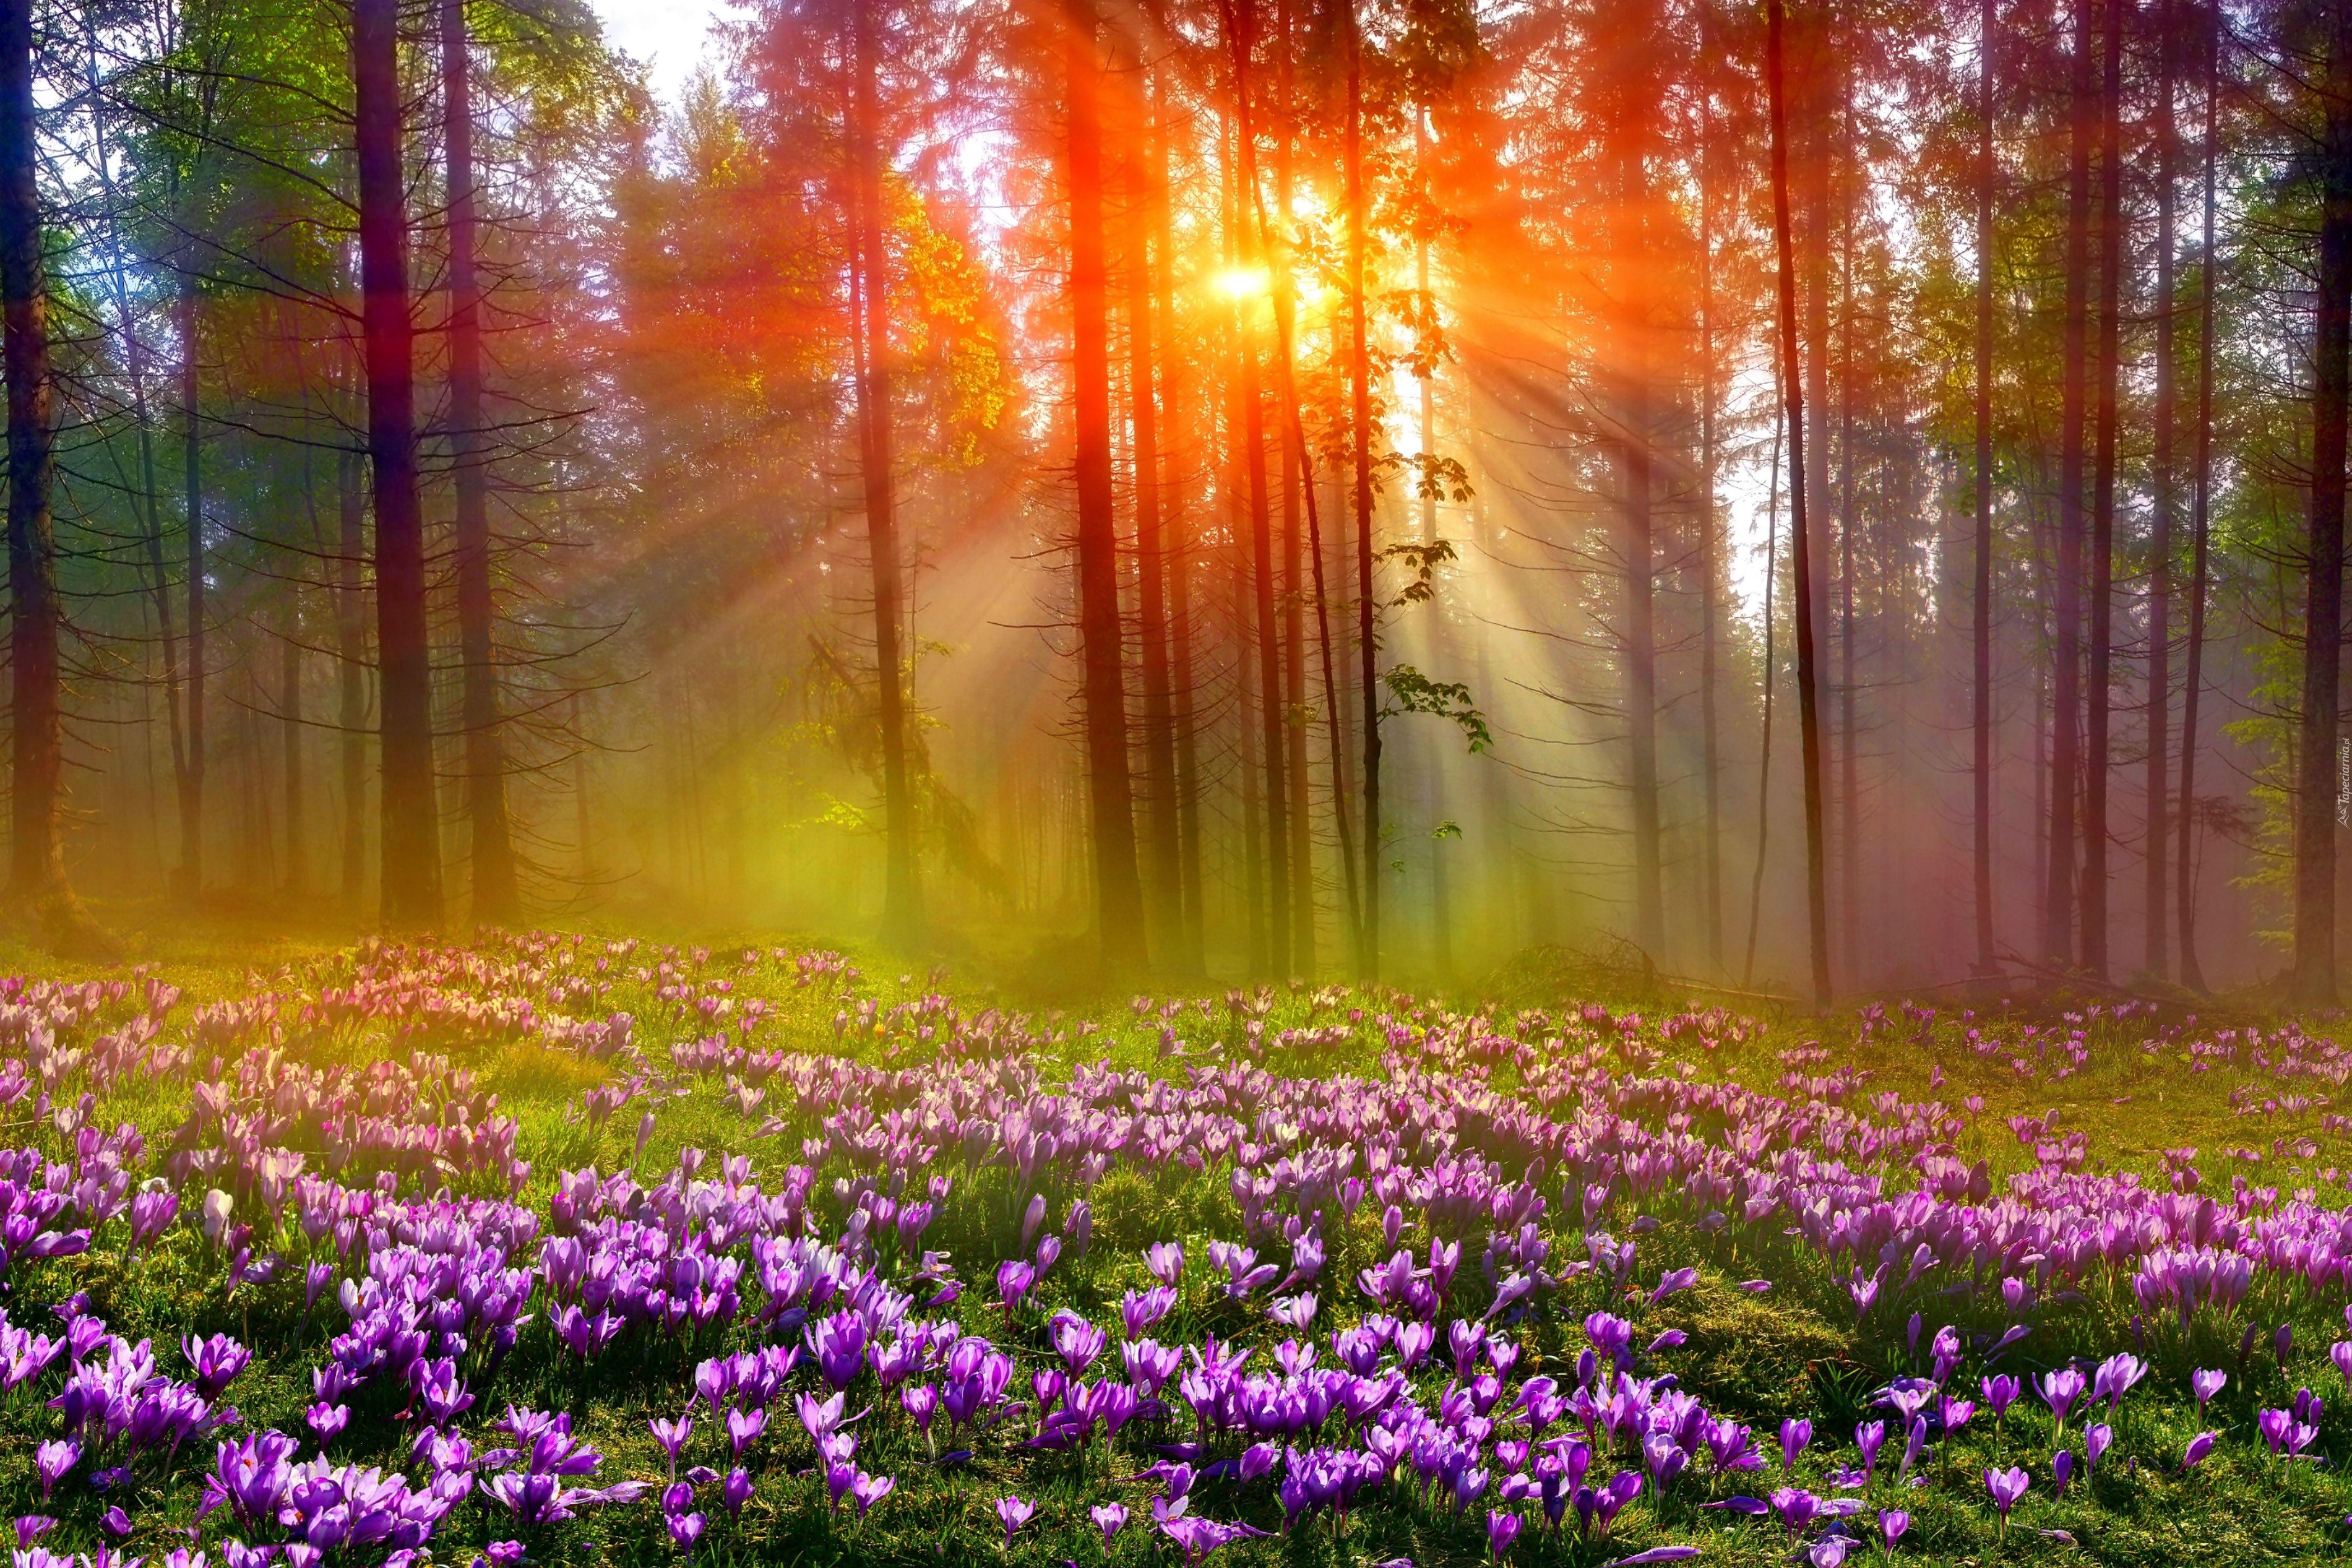 Las Drzewa Mgla Promienie Sloneczne Swit Jesienne Krokusy Beautiful Nature Nature Winter Trees